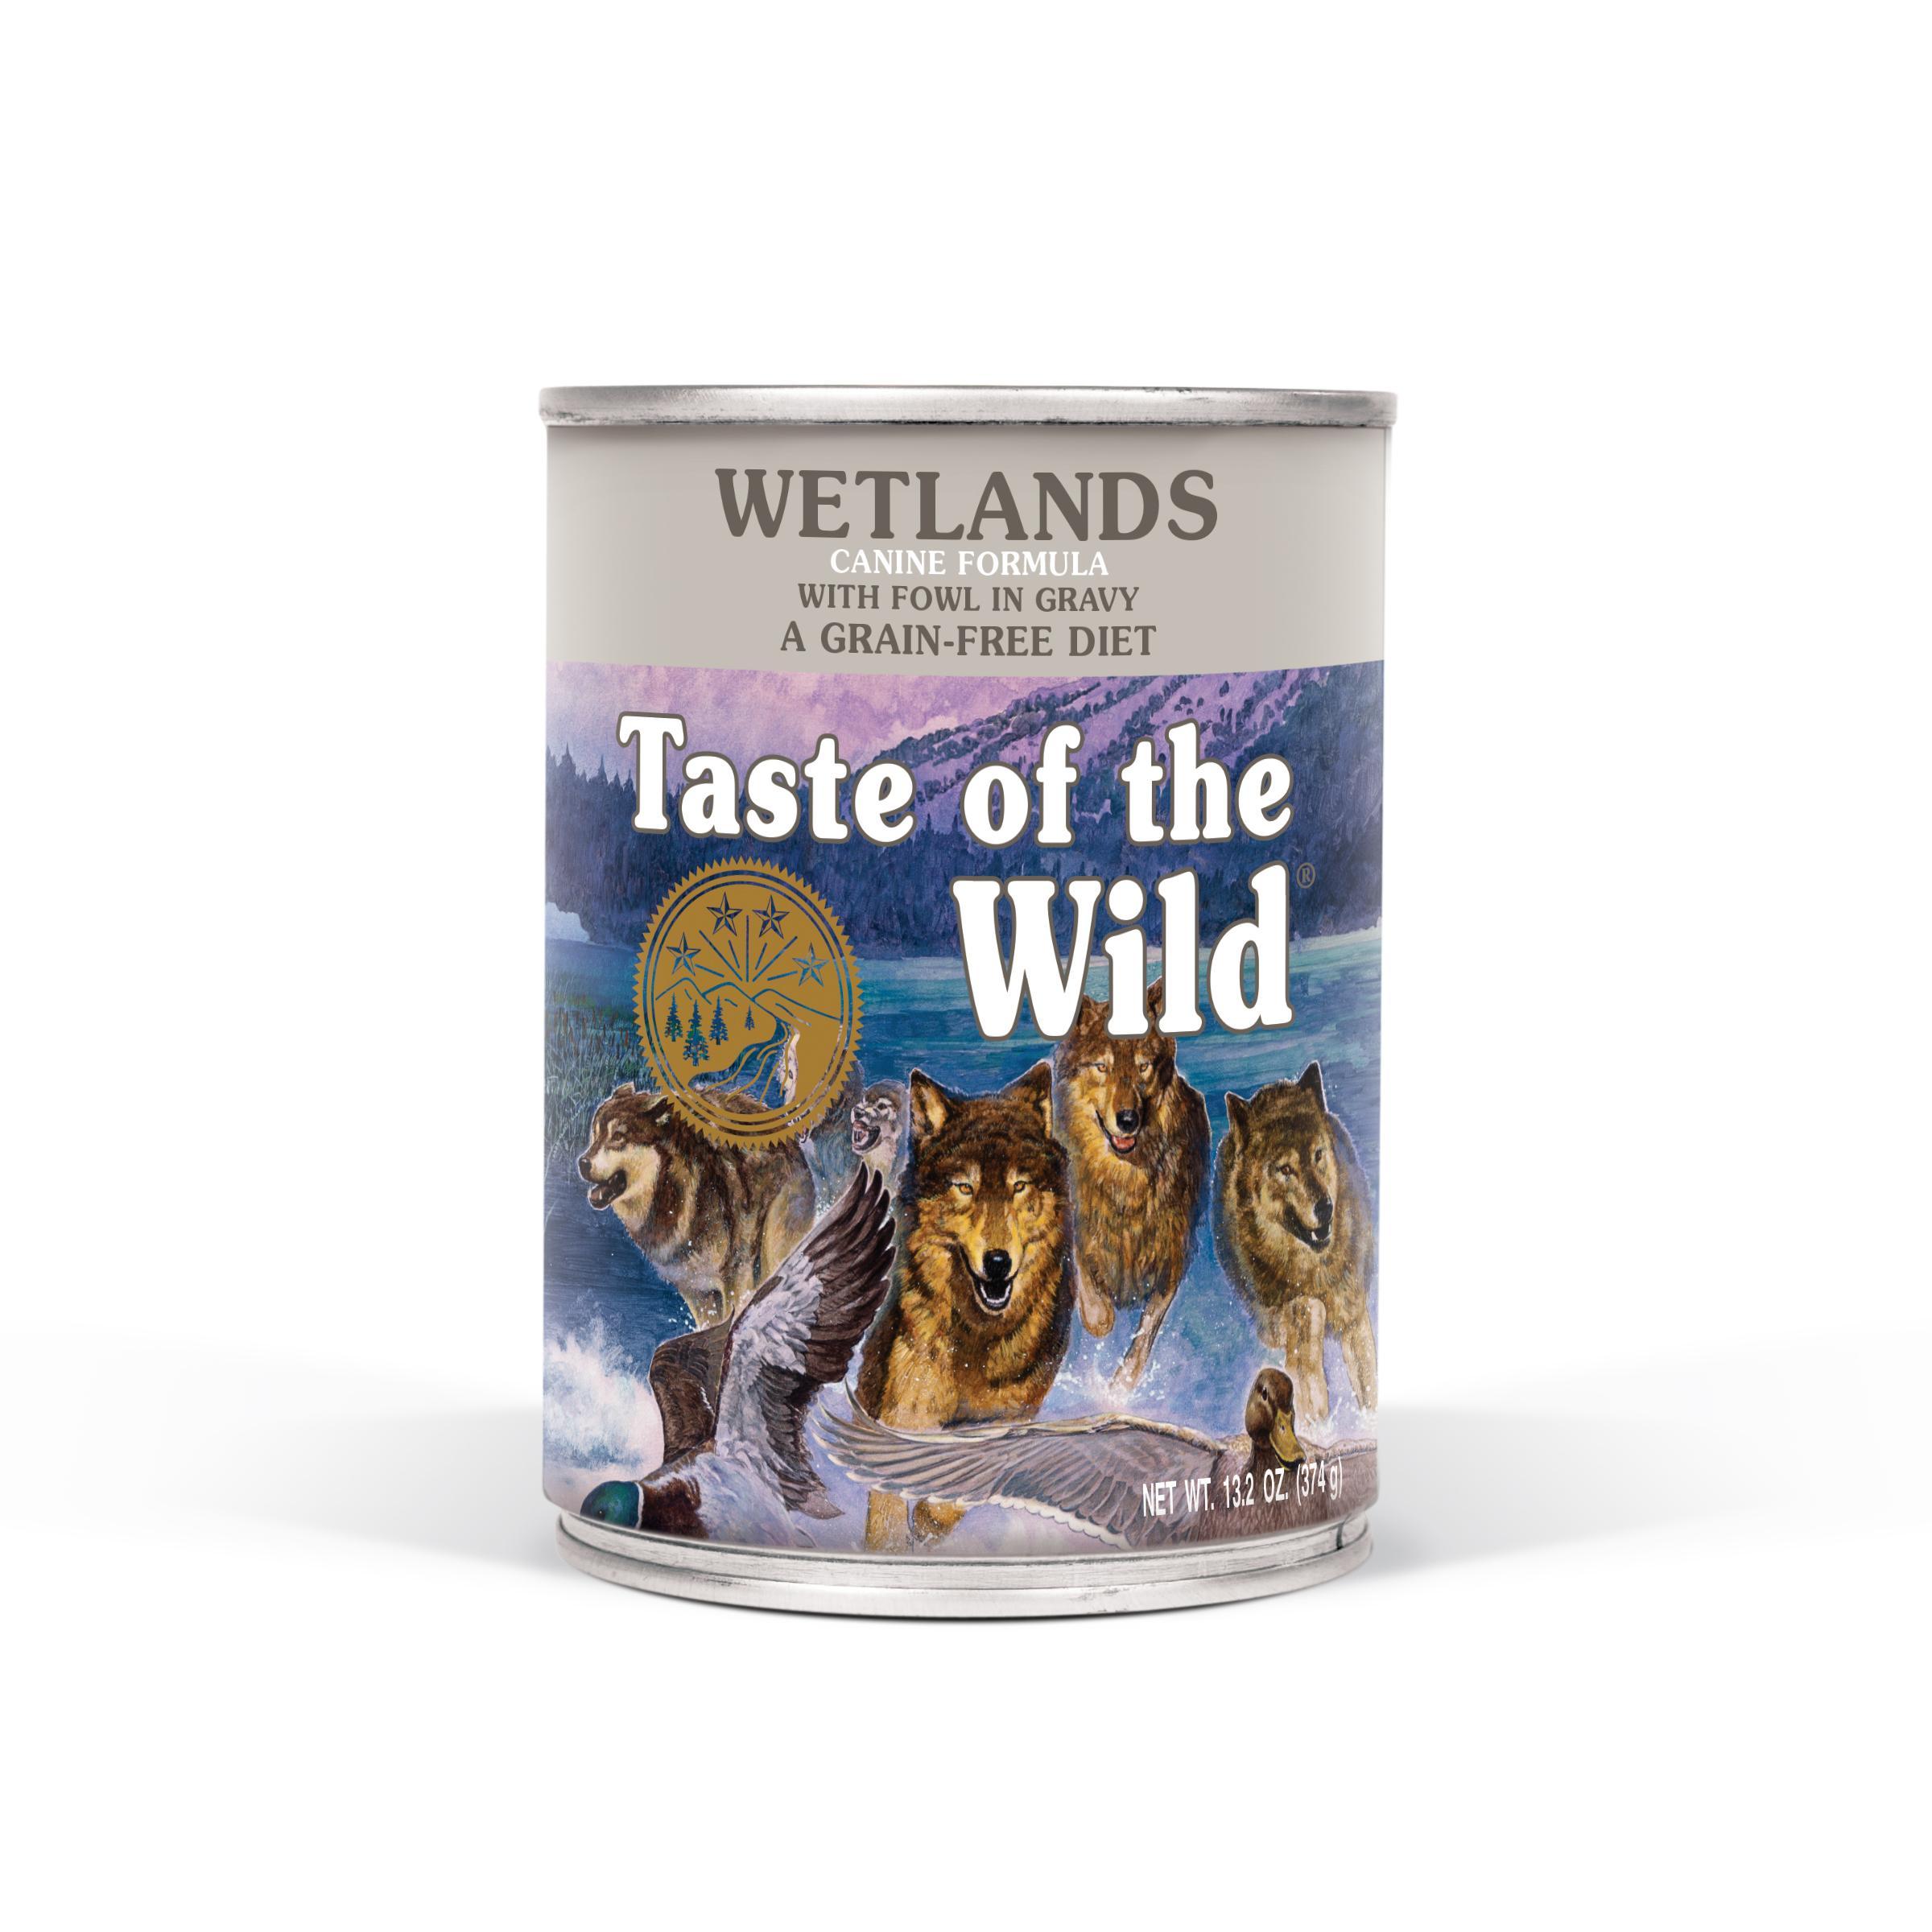 Taste of the Wild Wetlands Grain-Free Canned Dog Food, 13.2-oz